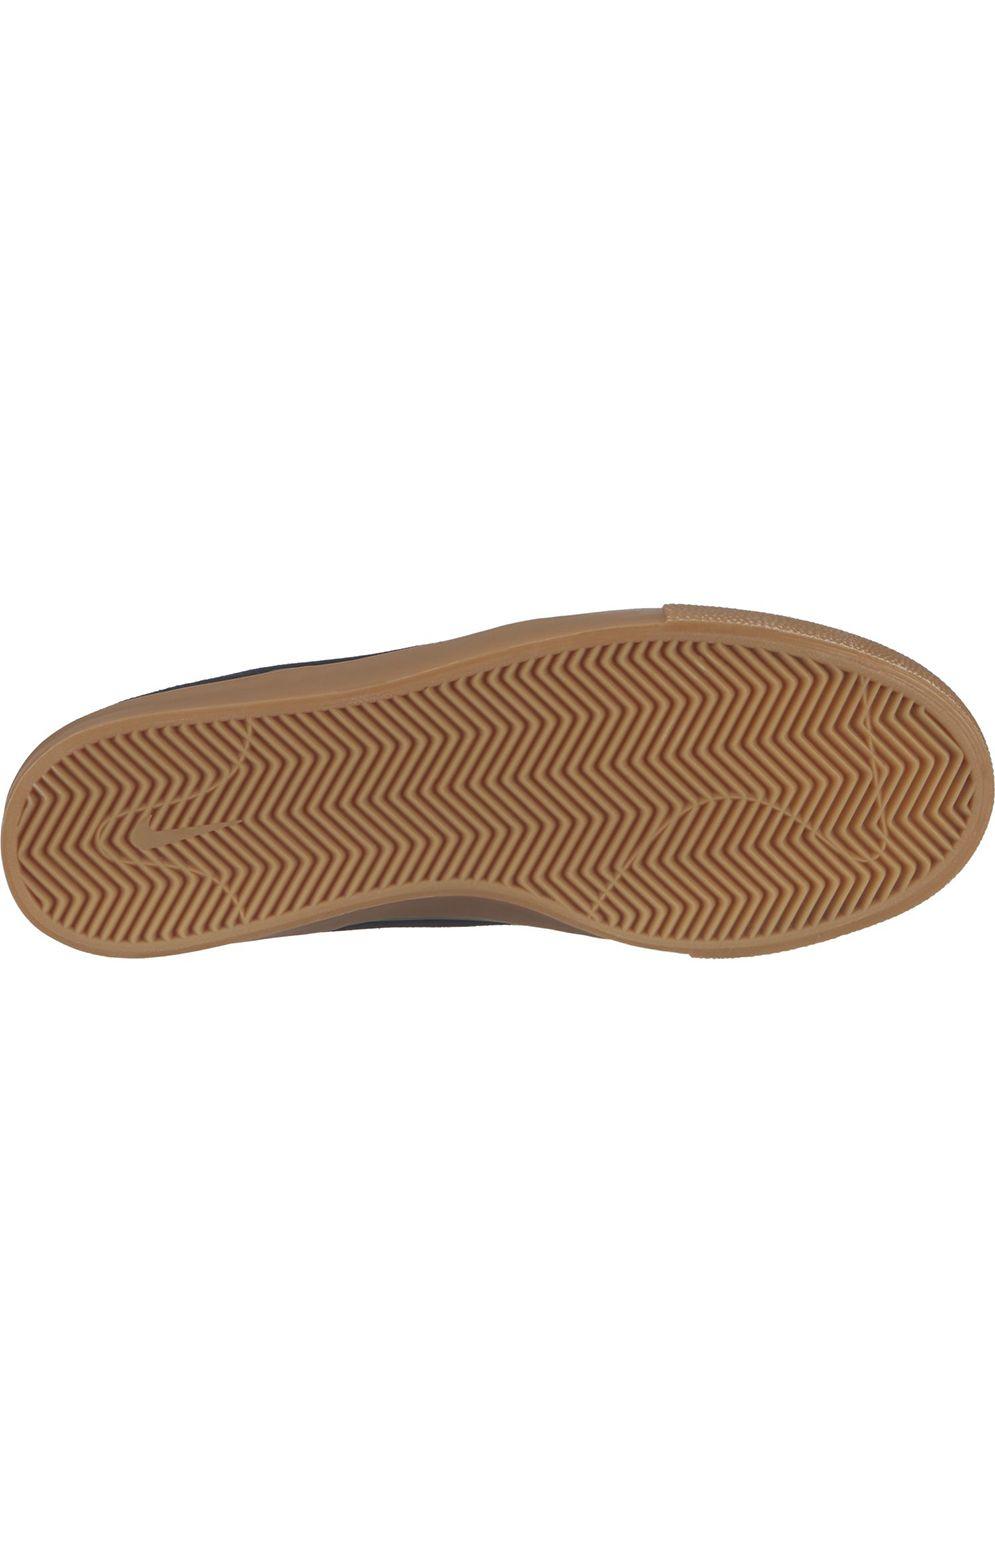 Nike Sb Shoes ZOOM STEFAN JANOSKI RM Black/White-Black-Gum Light Brown